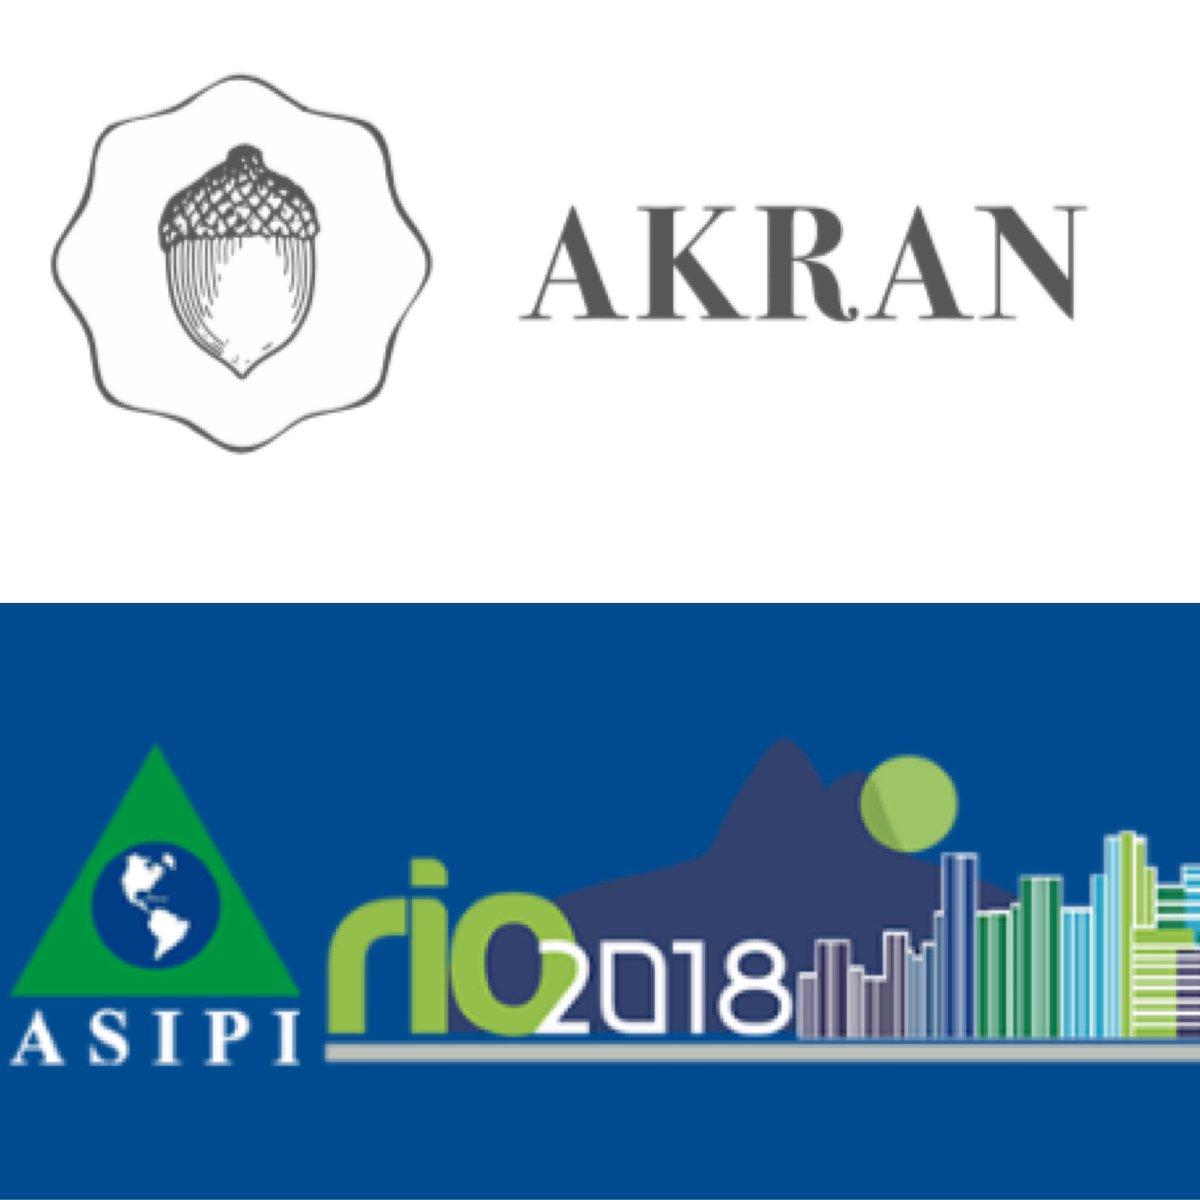 test Twitter Media - #ASIPI2018 Inter-American Association of Intellectual Property  Rio de Janeiro  November 25th - 28th 2018 https://t.co/jdSPuN9HQg